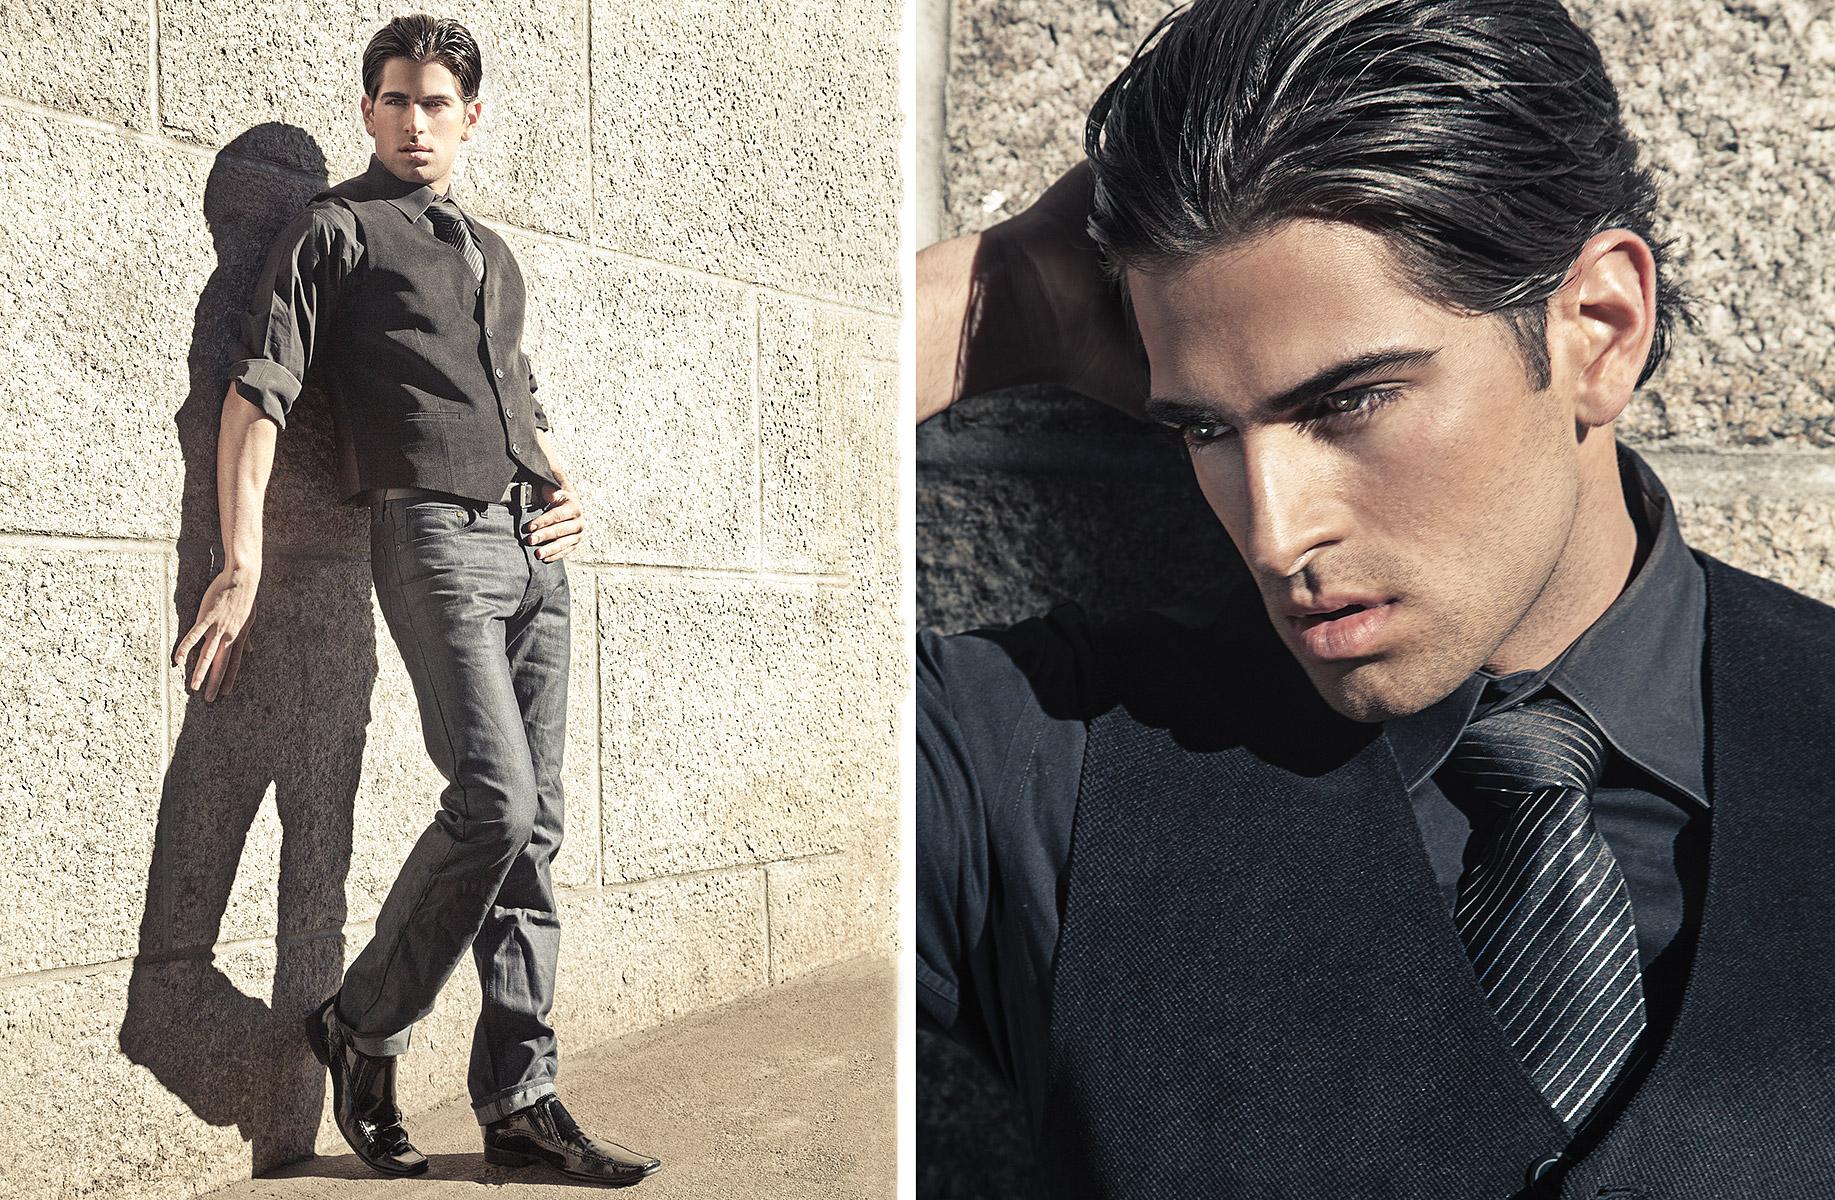 new-mexico-albuquerque-male-models-men-32.jpg